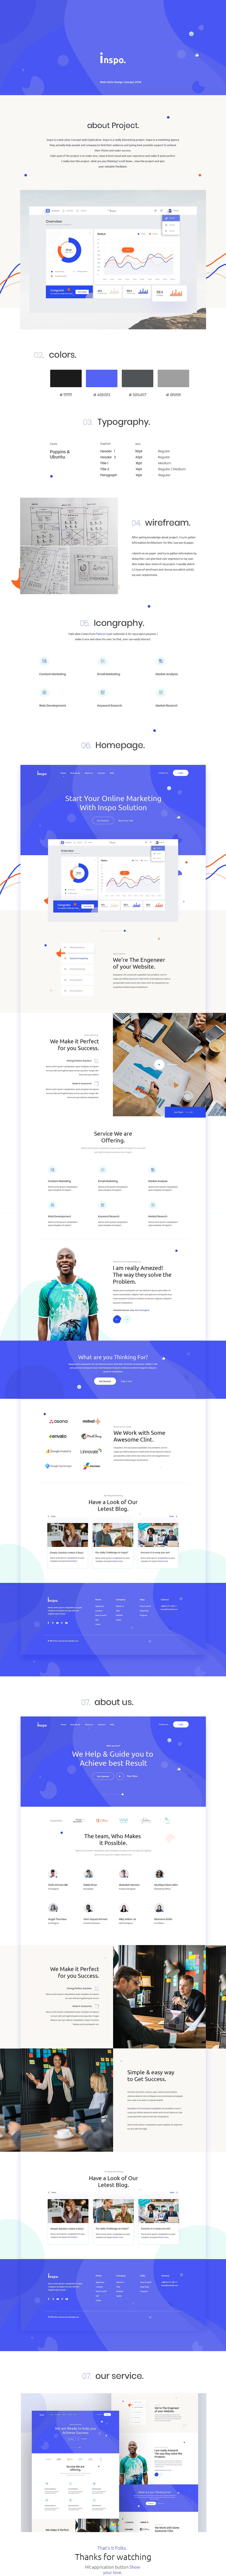 agency Webdesign UI ux Interface minimal management SEO free psd freebie